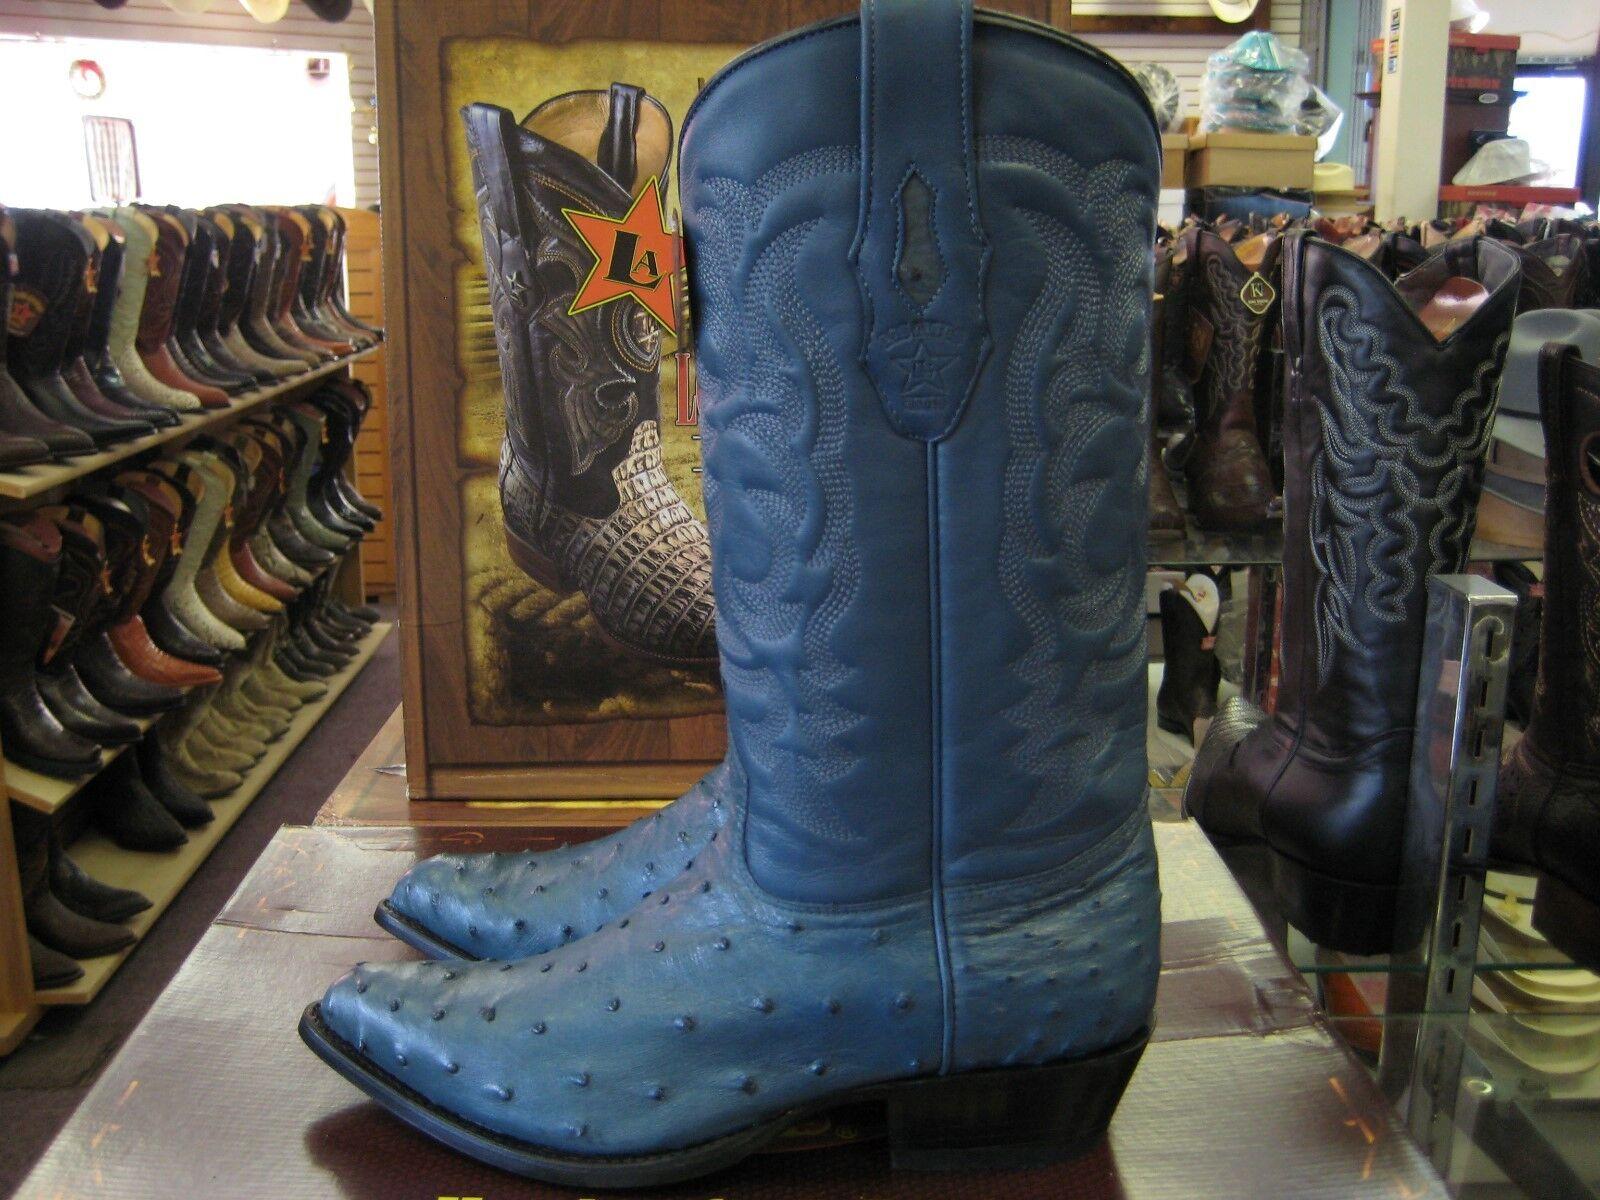 Men's Clarks Originals Desert Chukka 13 Boots Black Oiled Leather 13 Chukka M 49f1c2